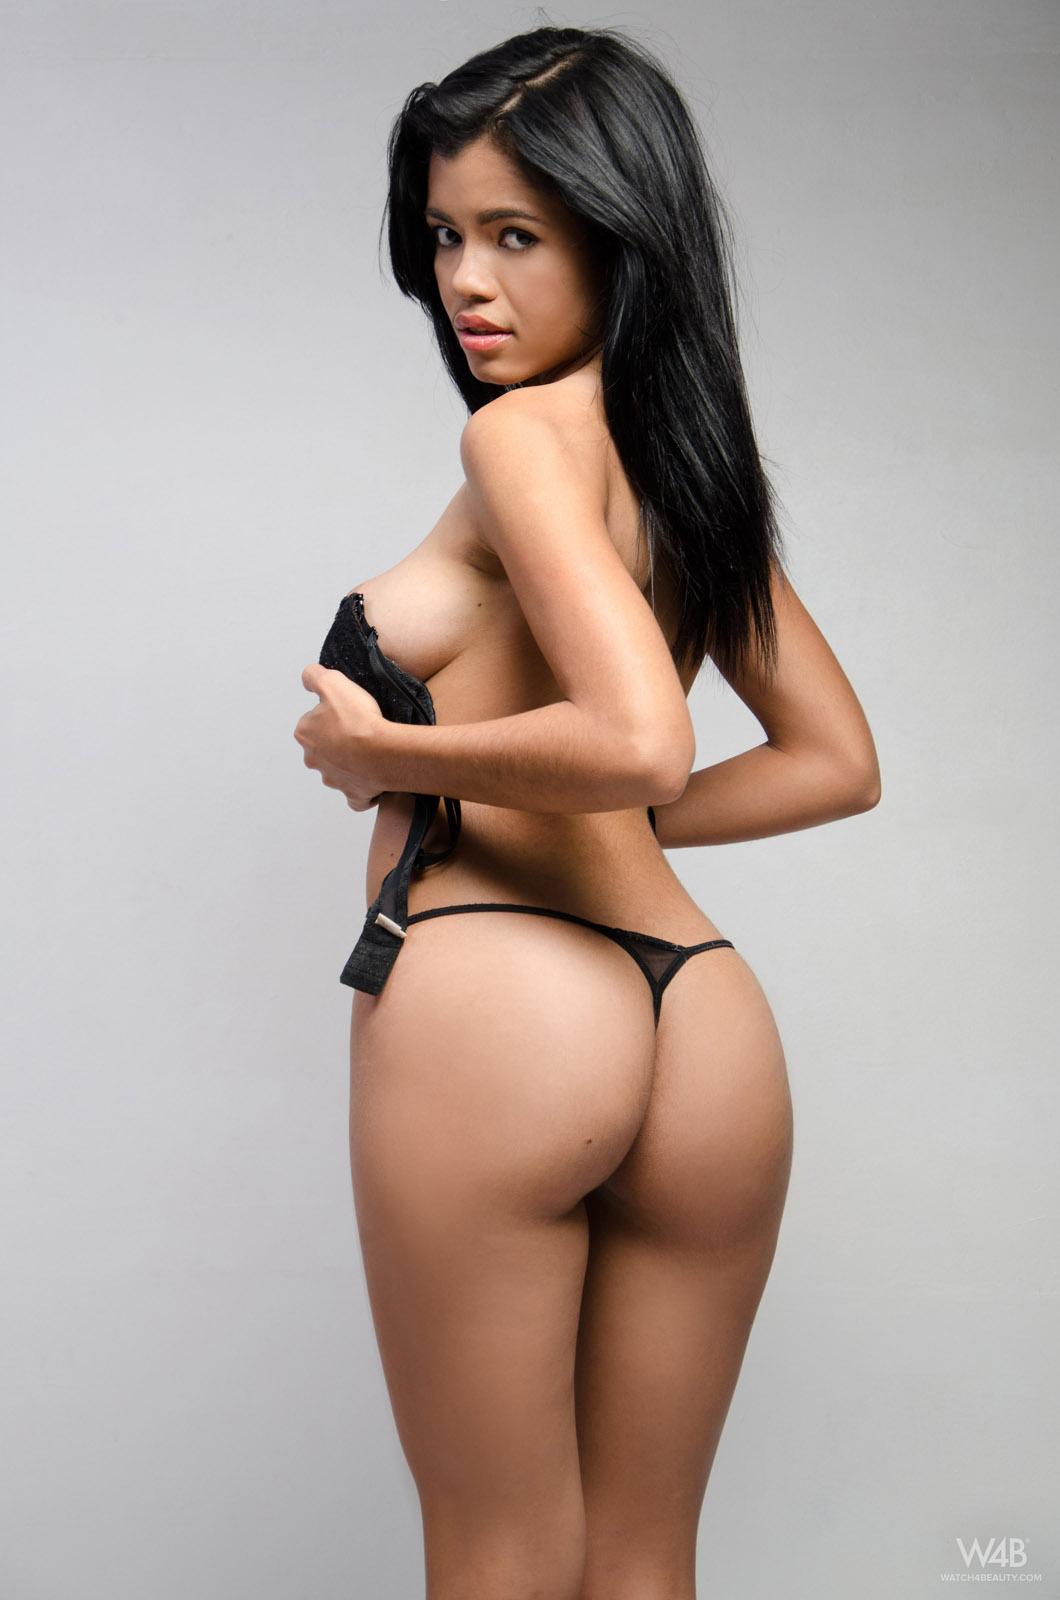 Naked and sexy colombian girl akito